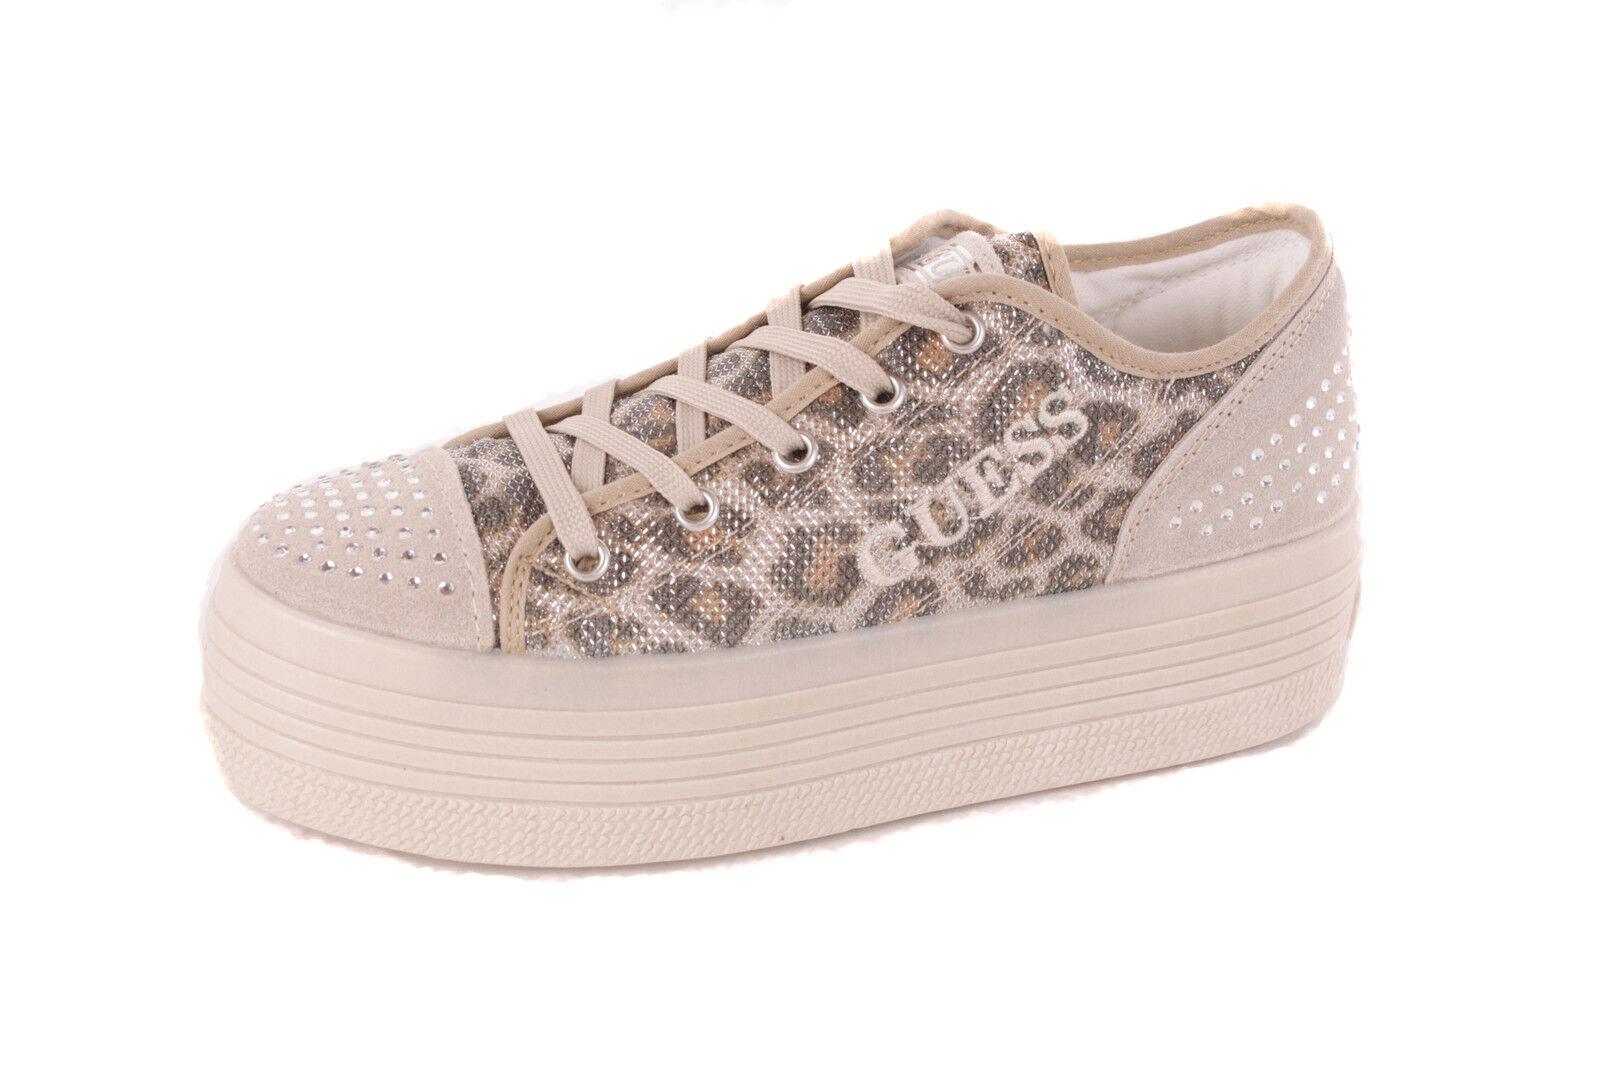 Guess women shoes da Ginnastica con Lacci Beige Stampa Leopardo  505